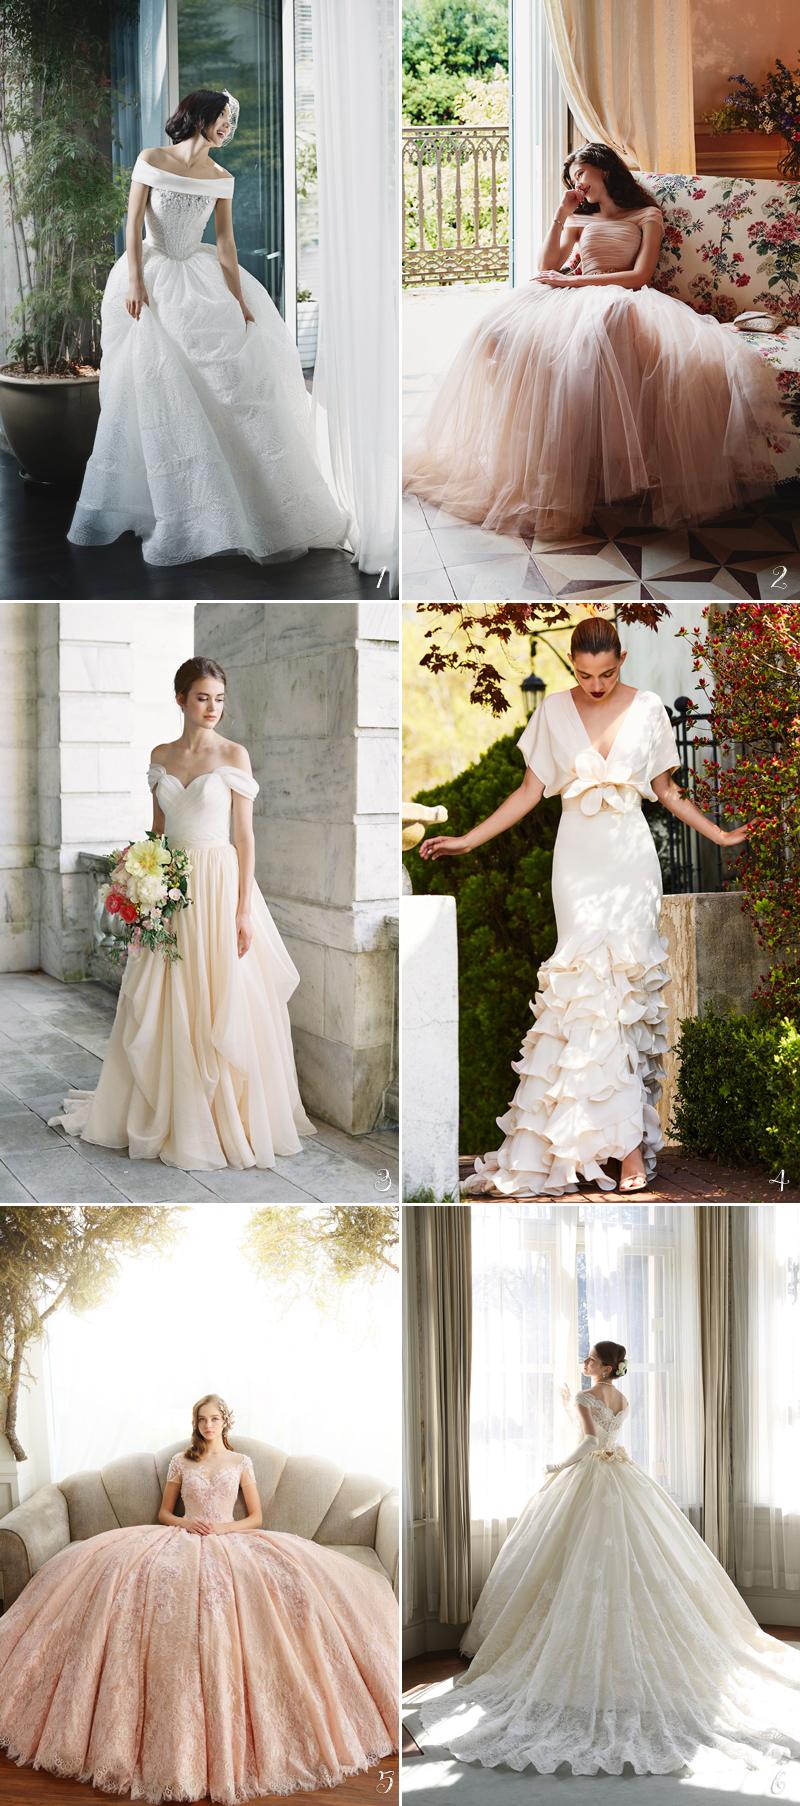 outdoorweddingdress04-villa-castle